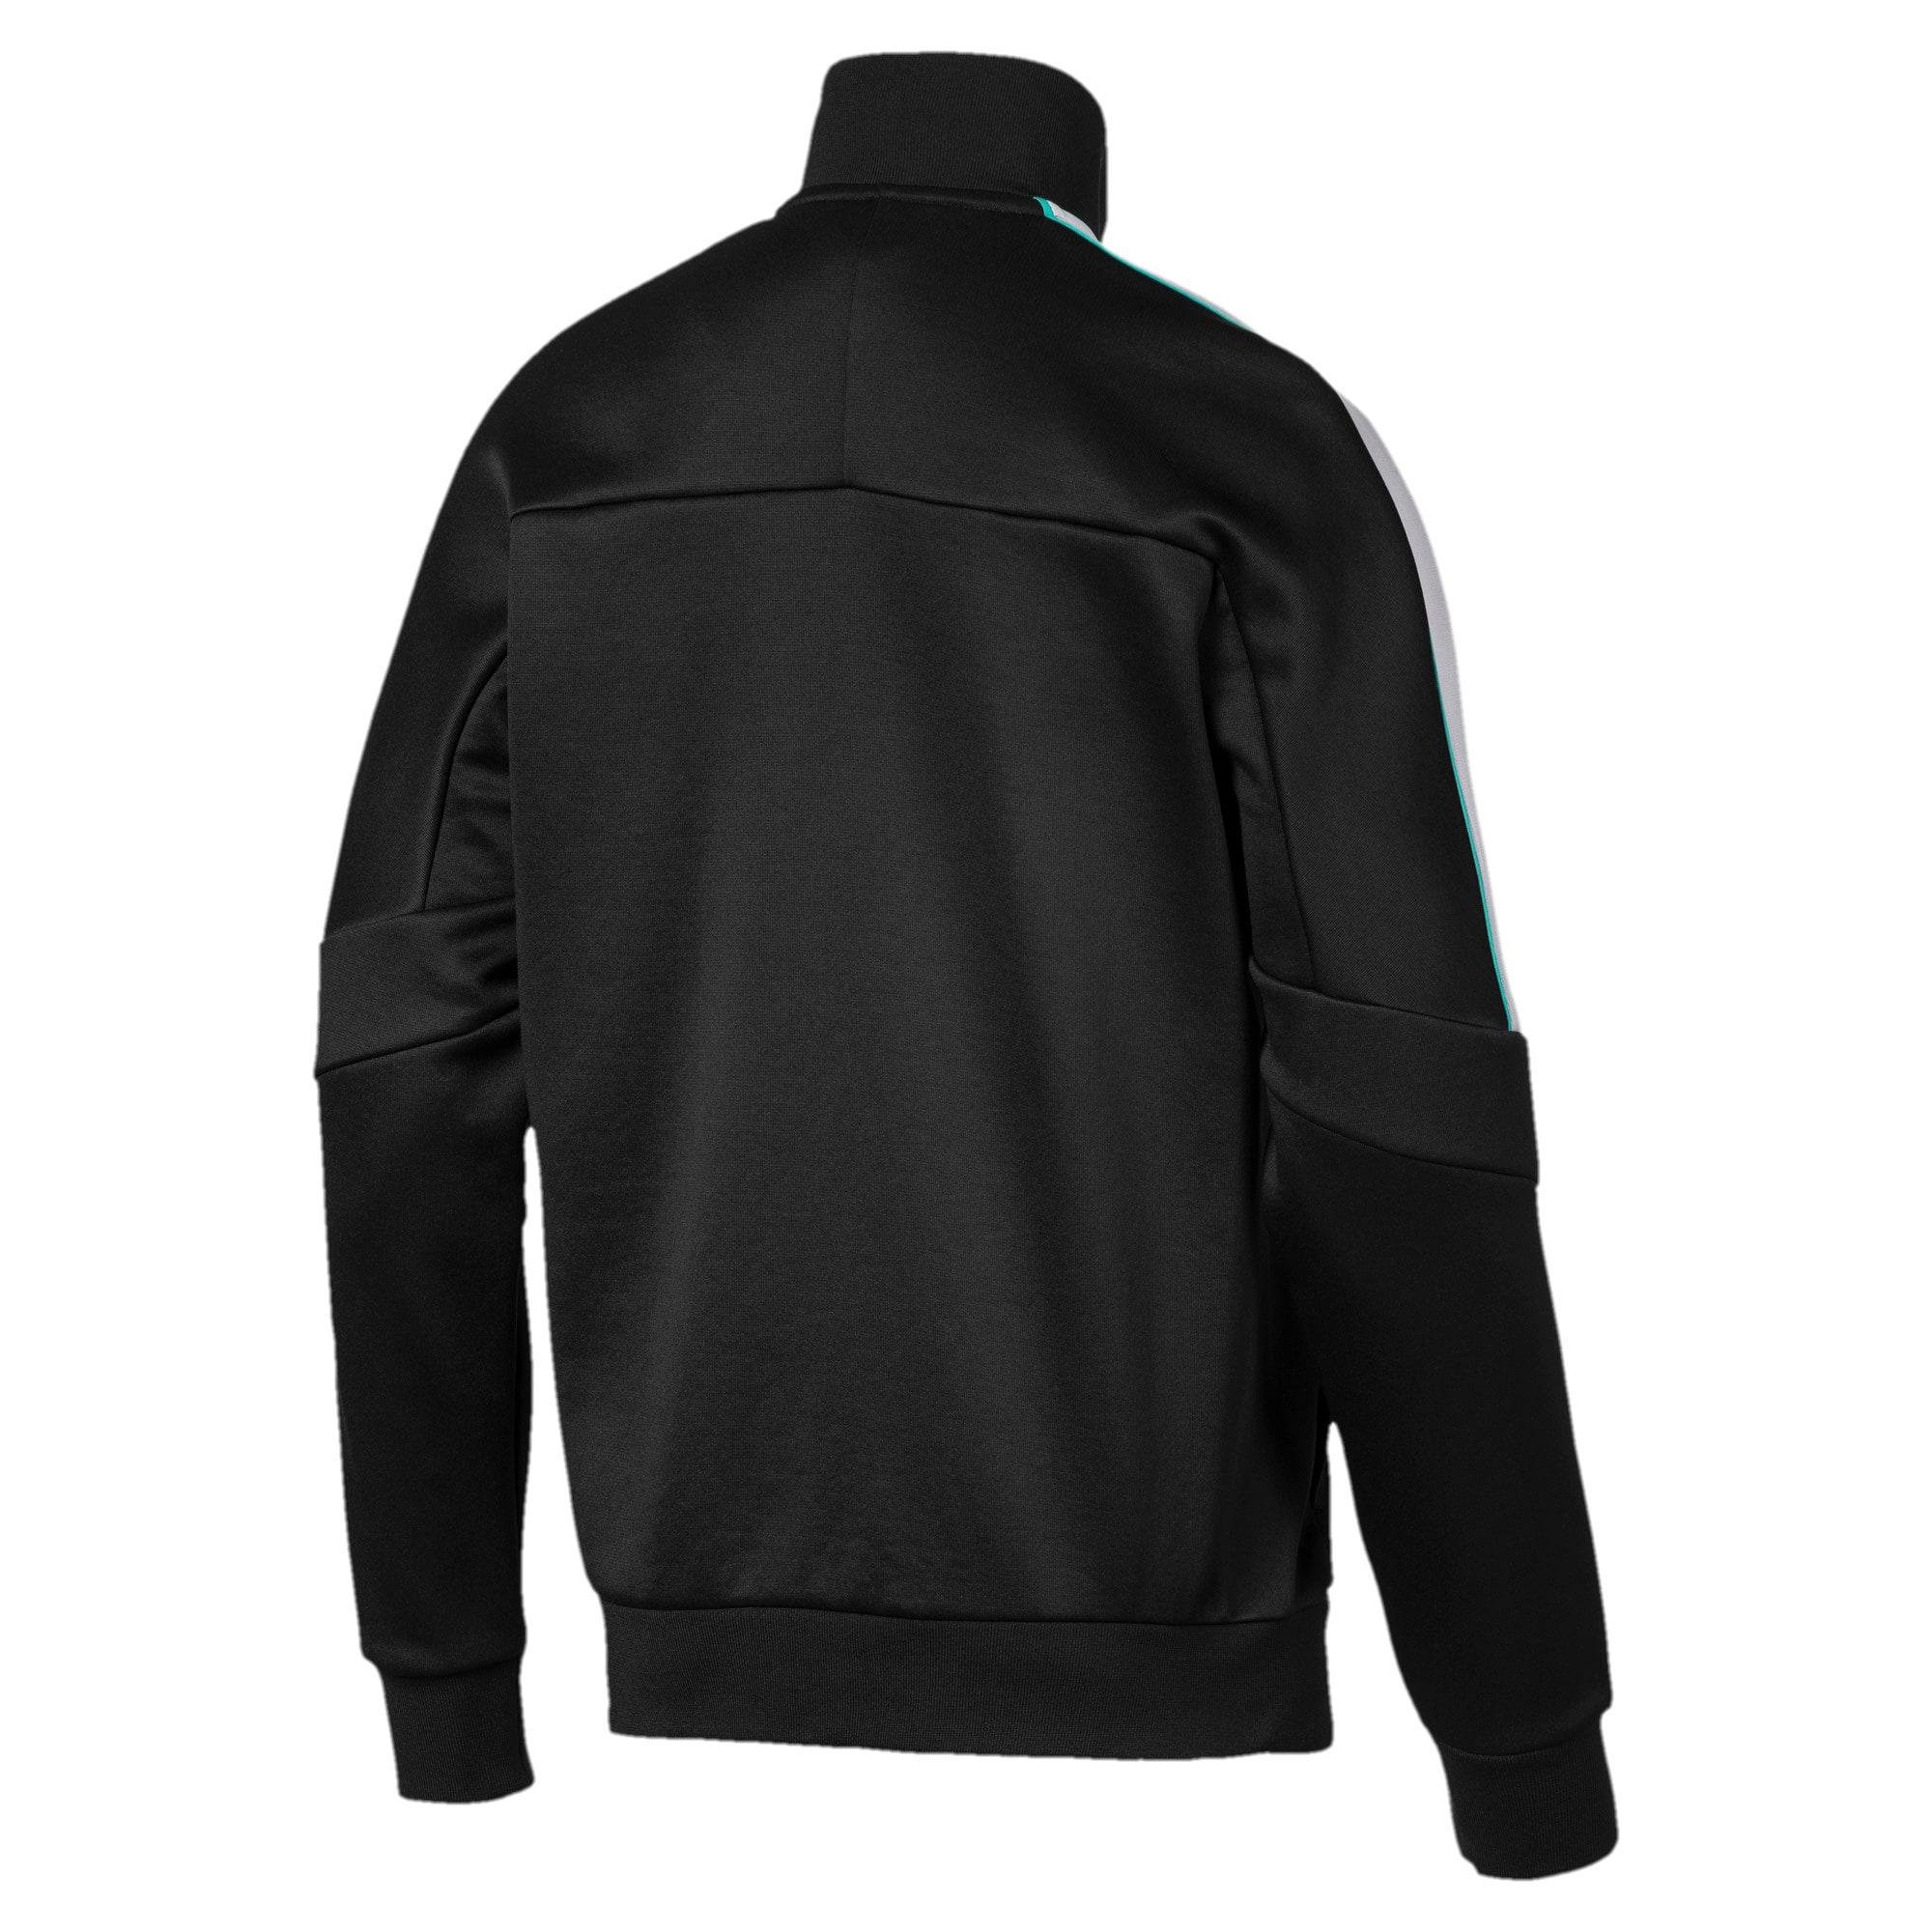 Thumbnail 6 of MAPM T7 Men's Track Jacket, Puma Black, medium